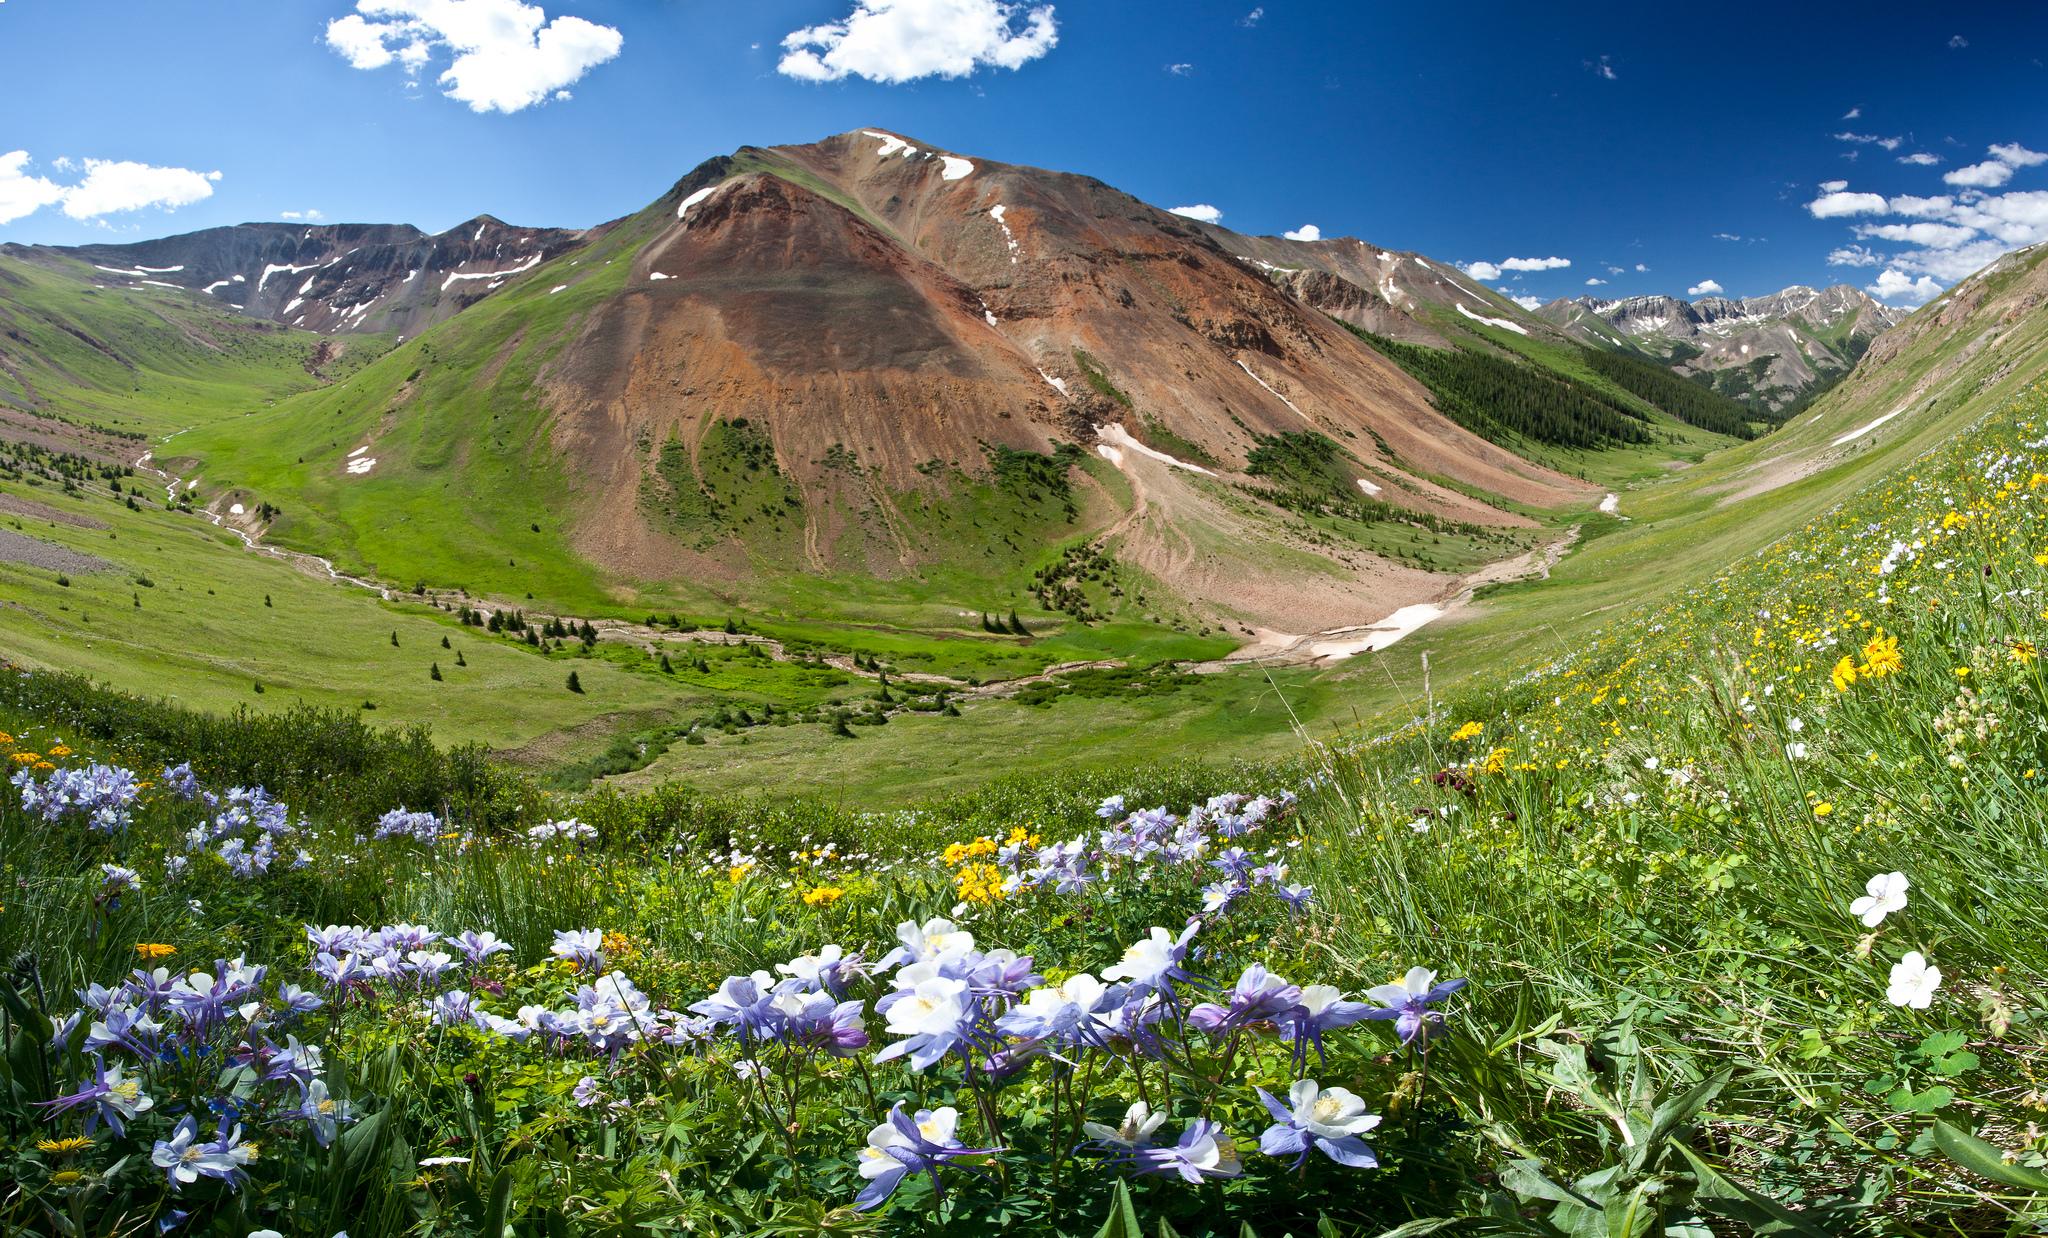 Photo: Red Cloud Peak Wilderness (Flickr/CC)